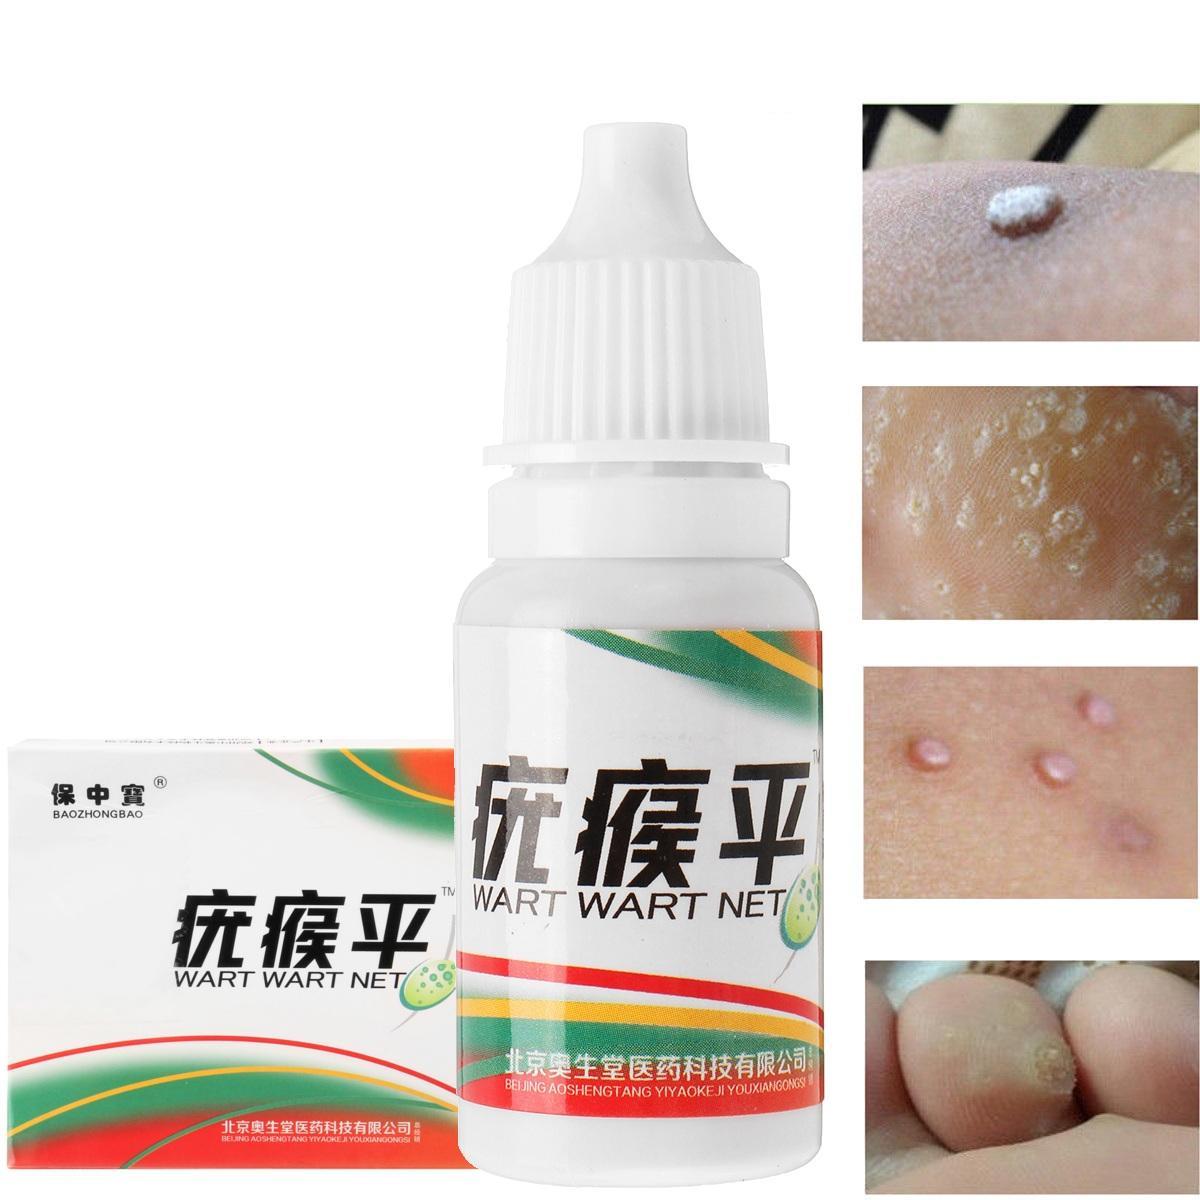 wart cream on skin tags